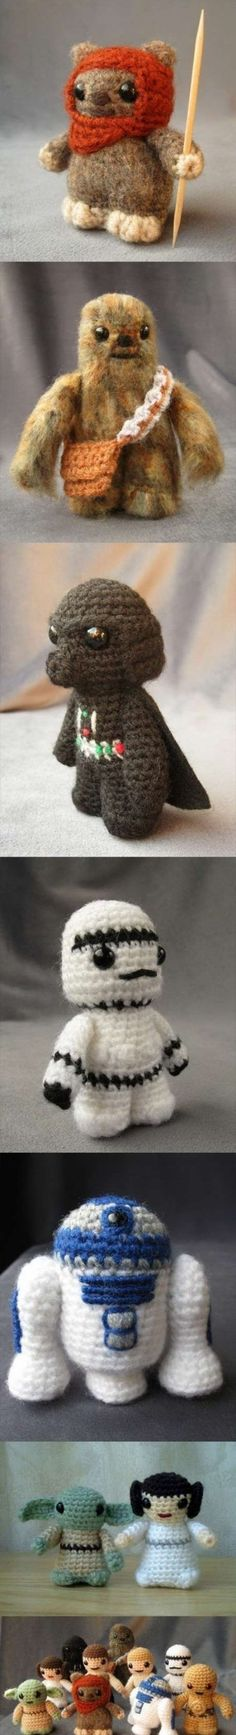 ERROR: Cuteness Overload!